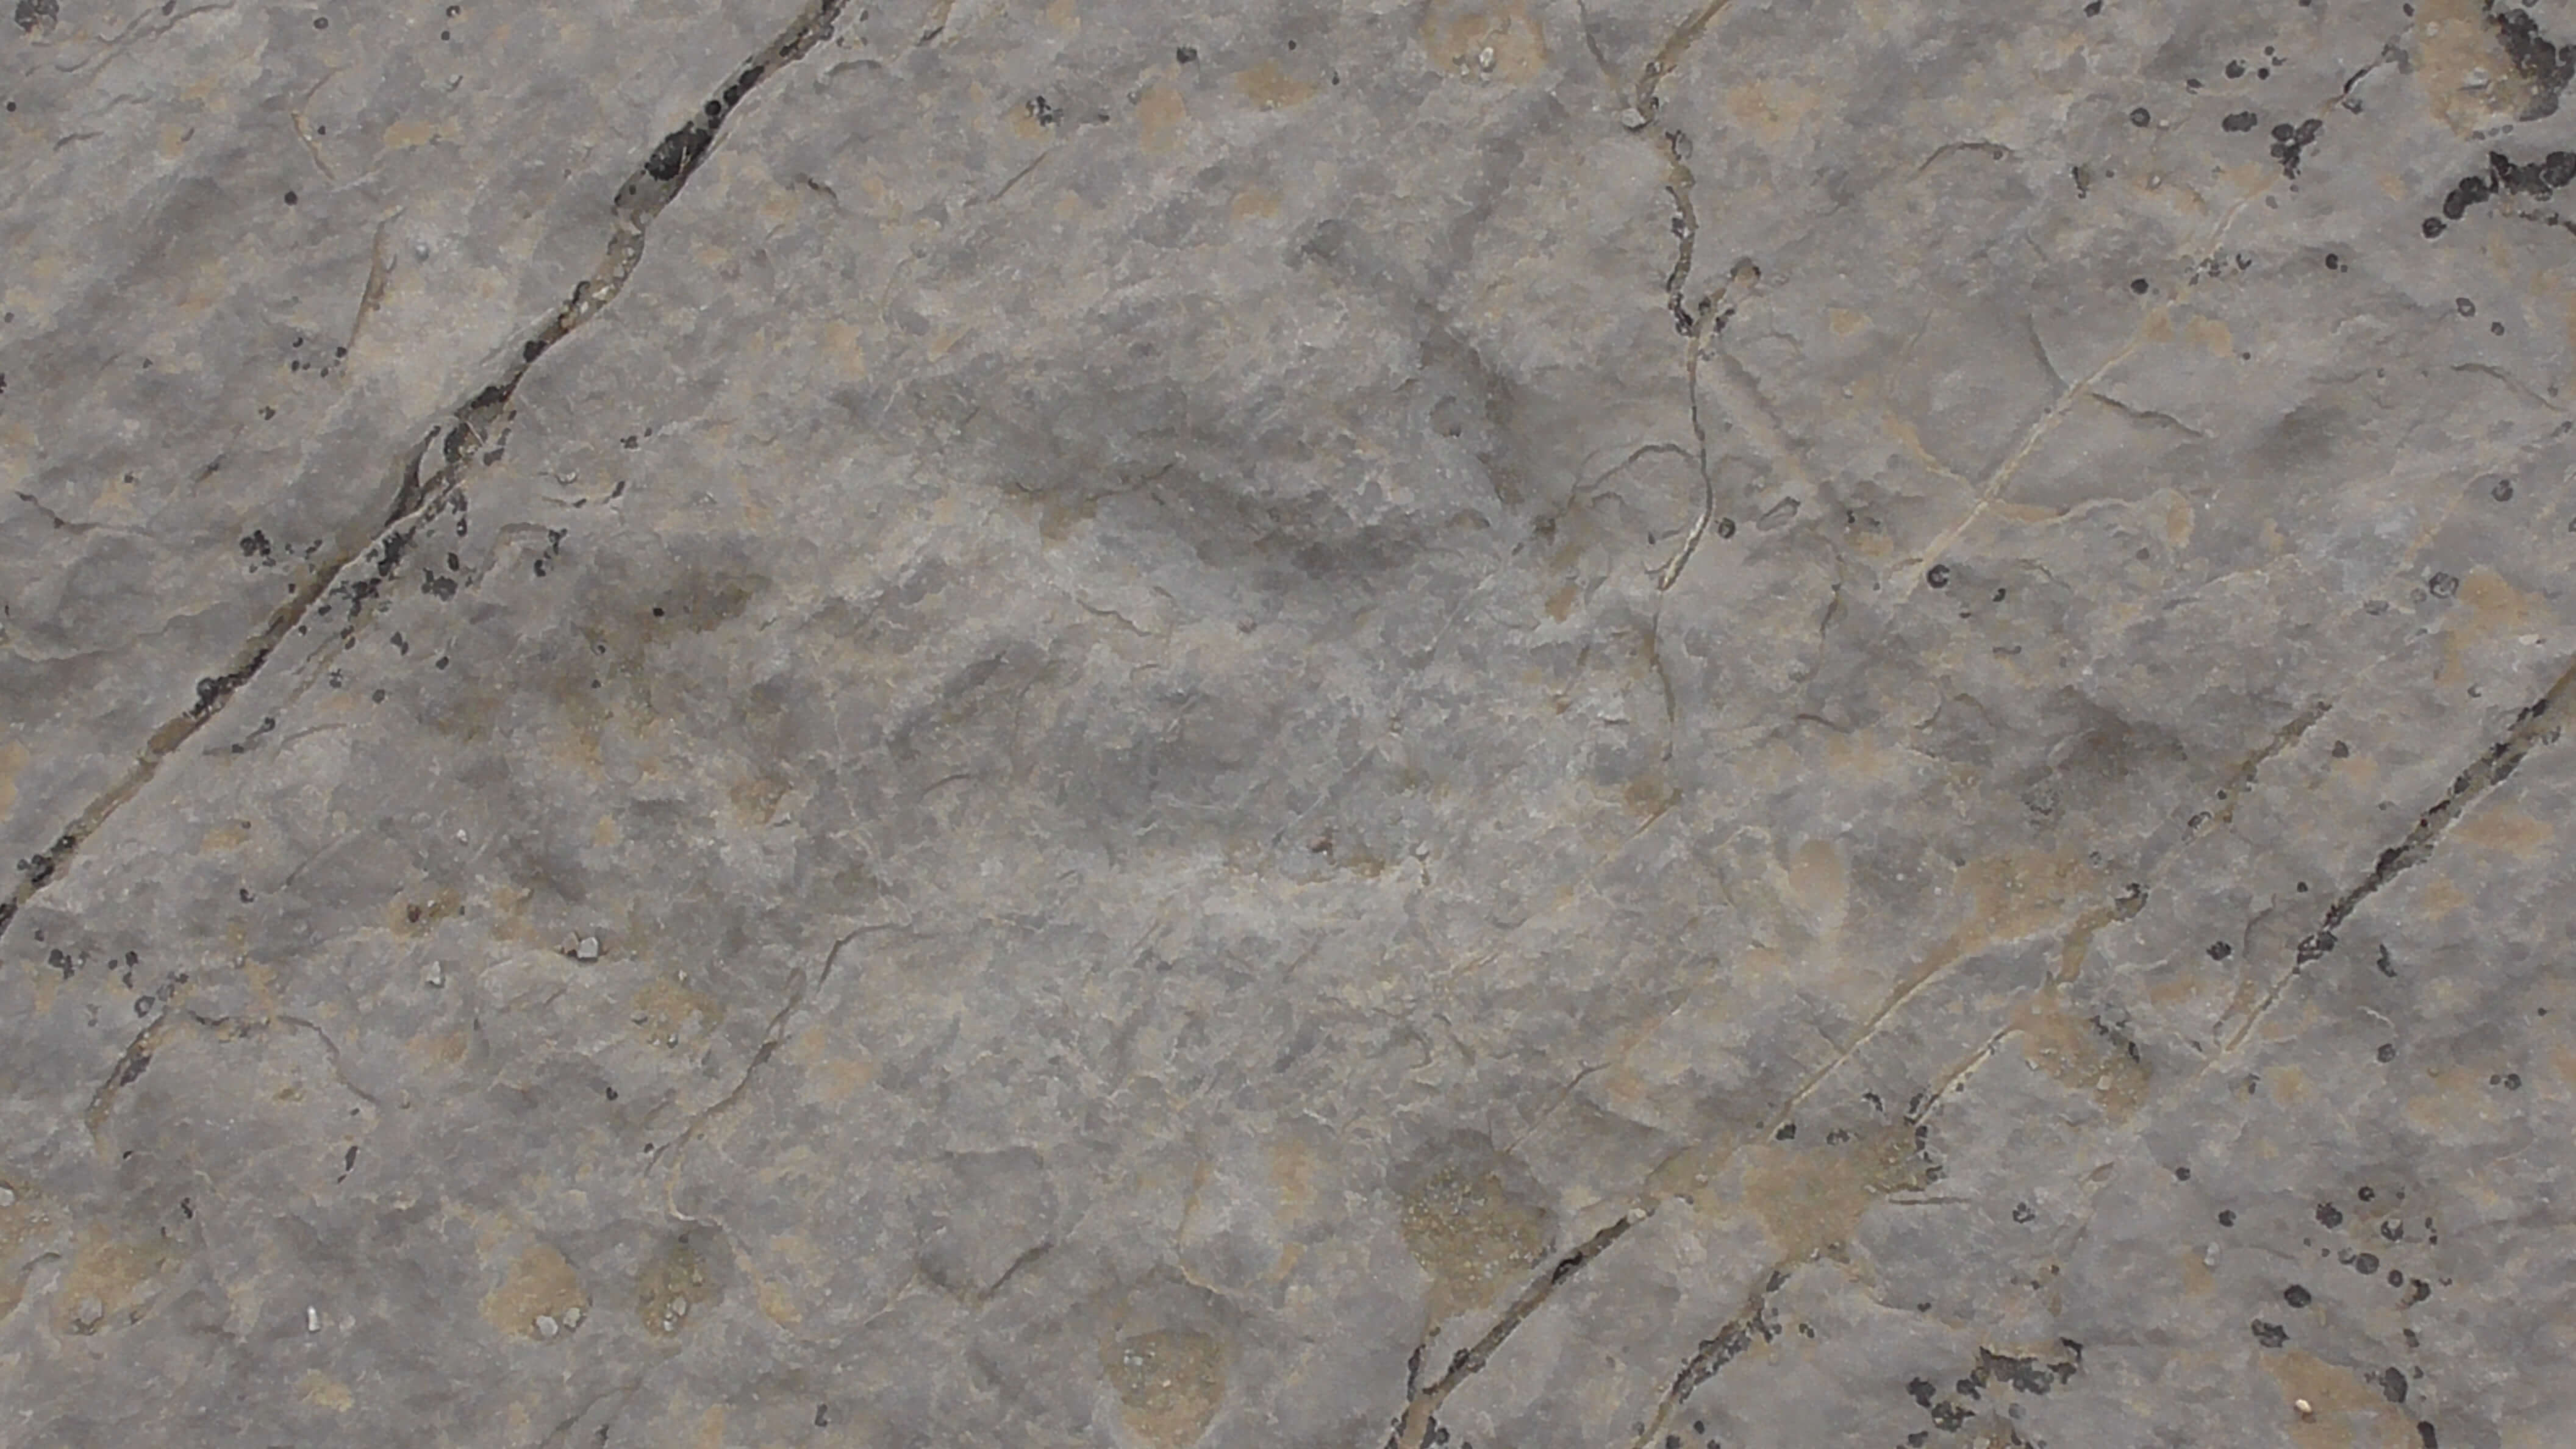 Red Gulch Dinosaur Tracksite, Wyoming